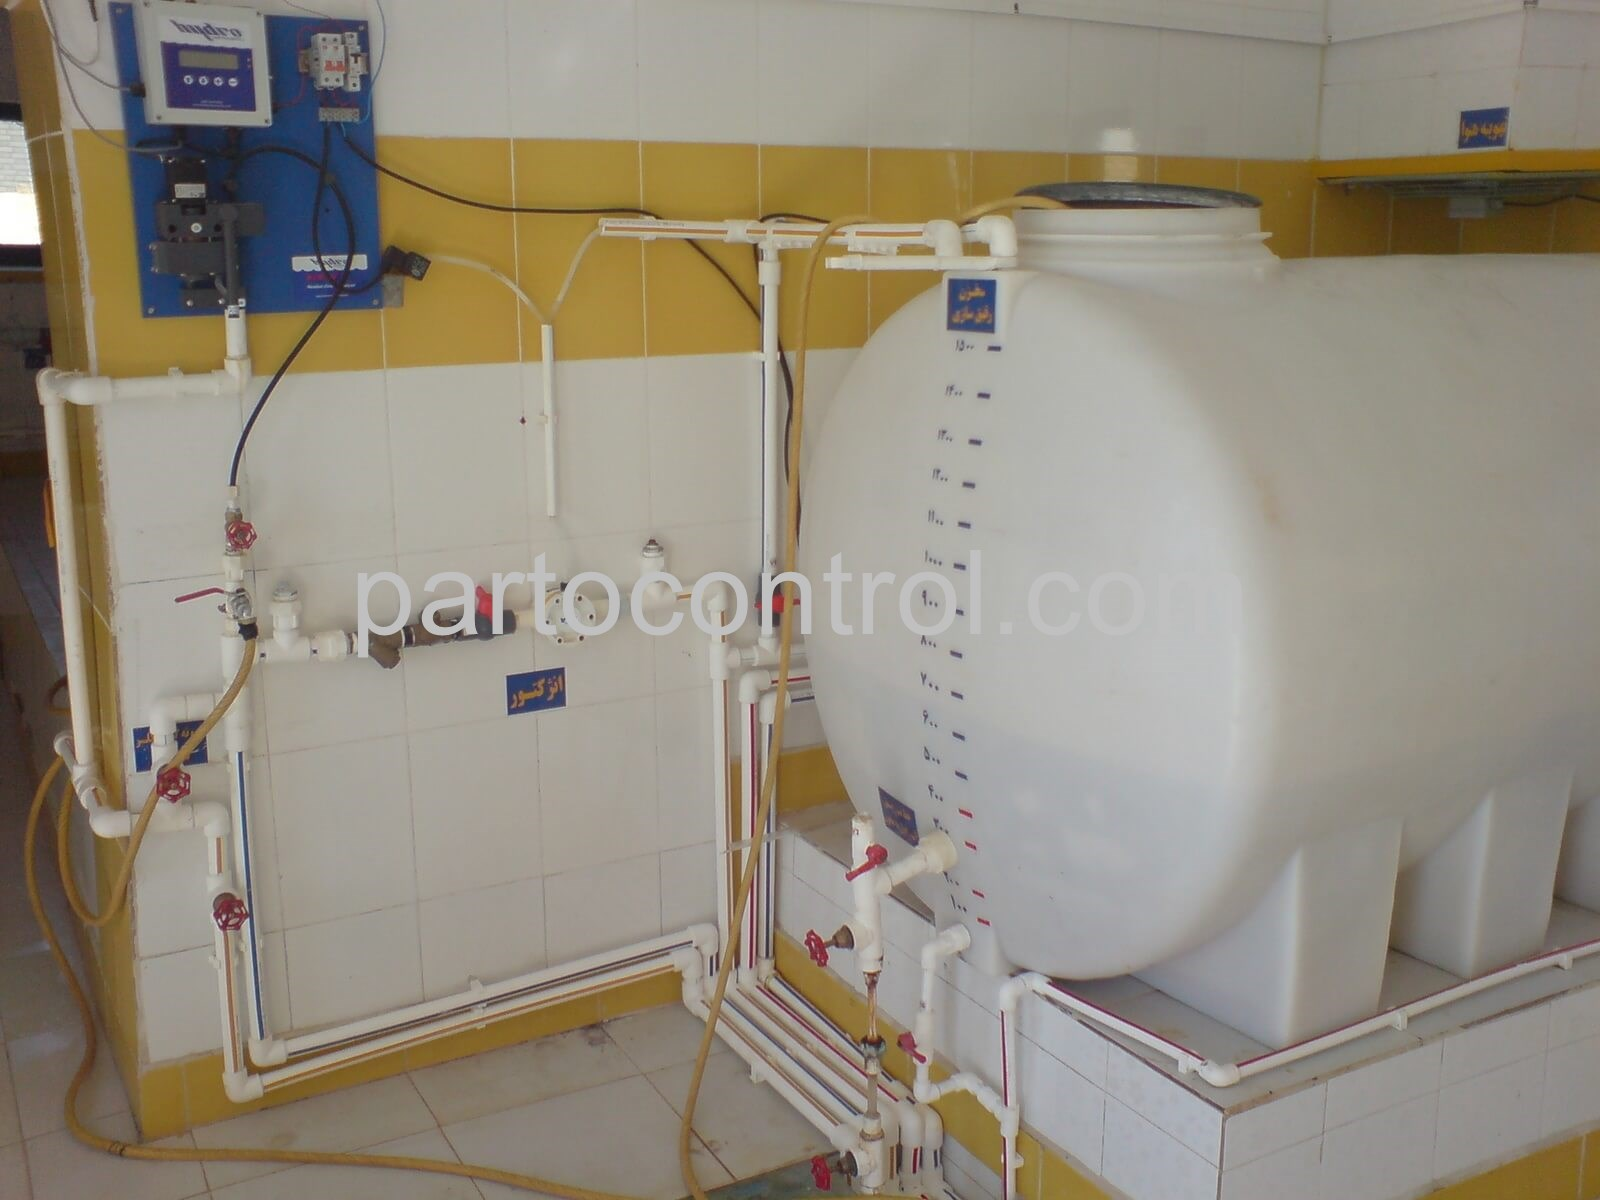 Liquid chlorine of sabzevarکلرزن مایع سبزوار1 - پروژه کلرزن مایع